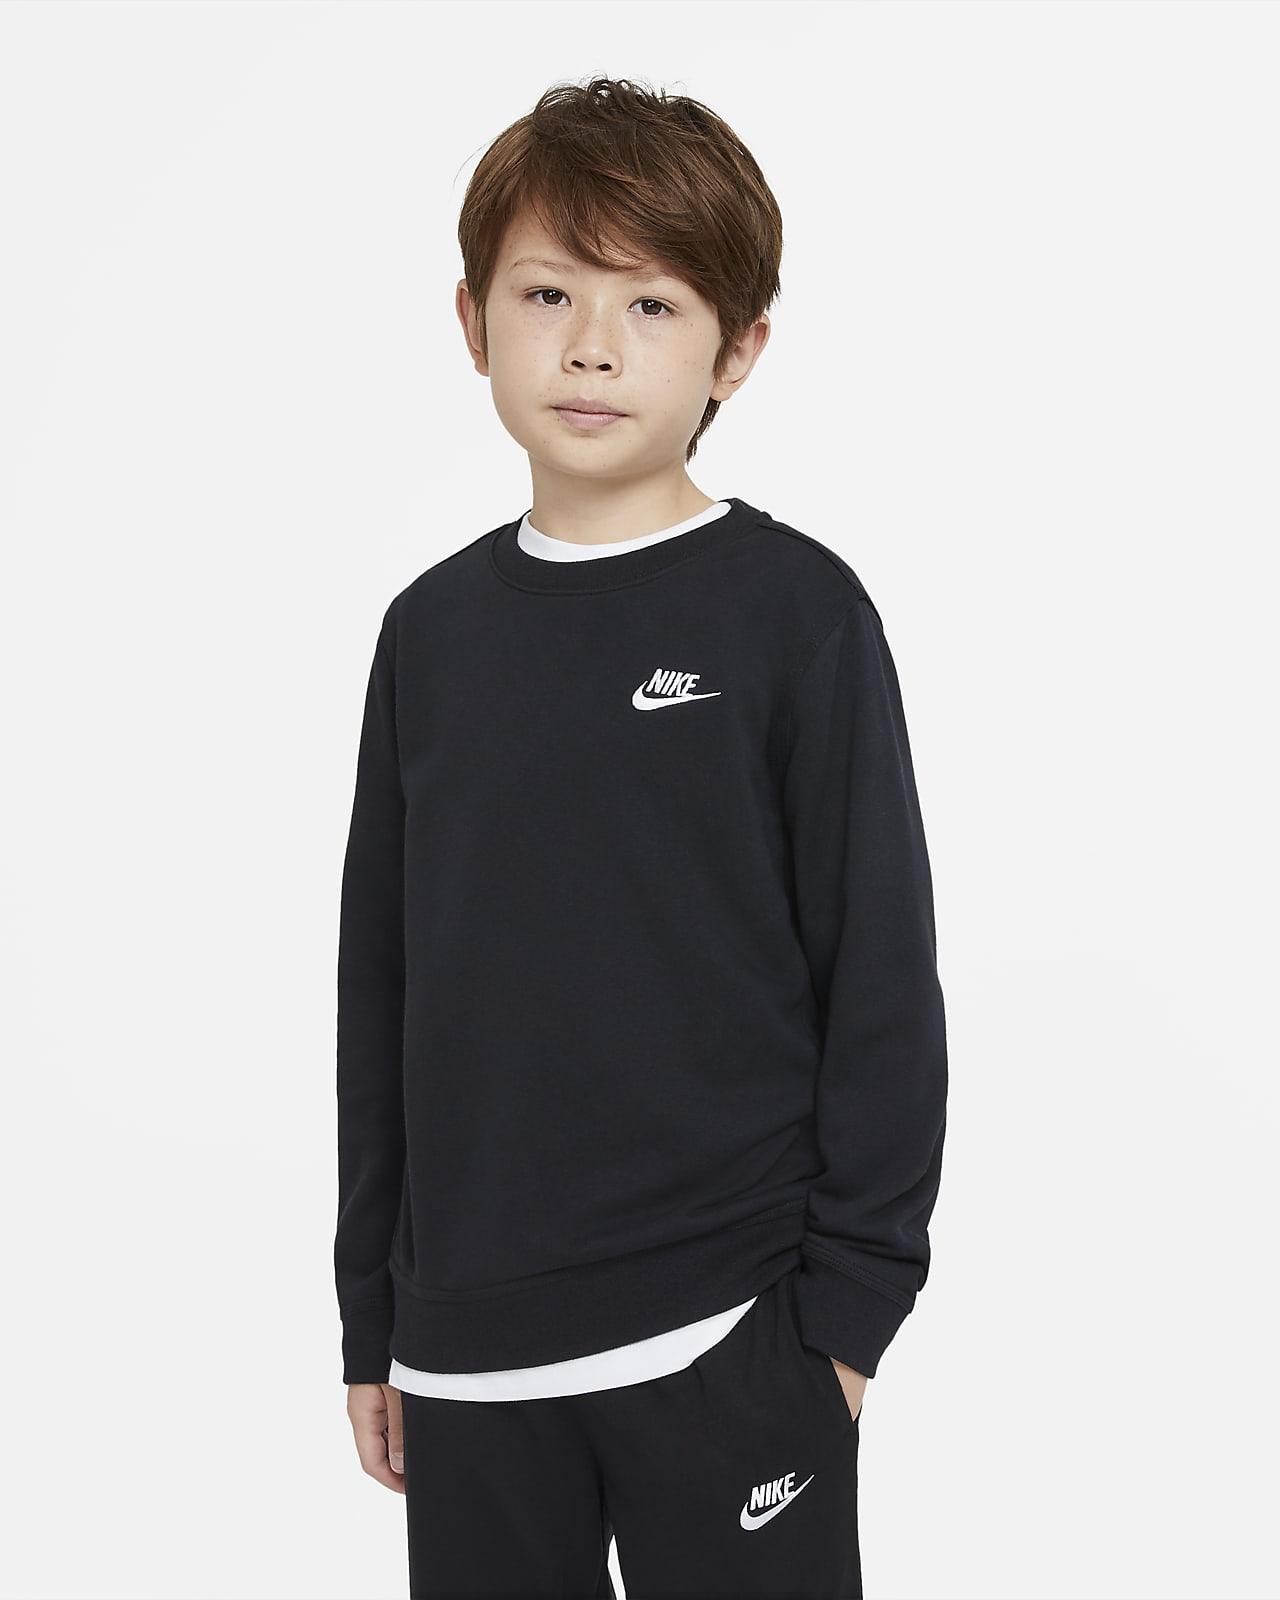 Nike Sportswear Older Kids' (Boys') French Terry Crew